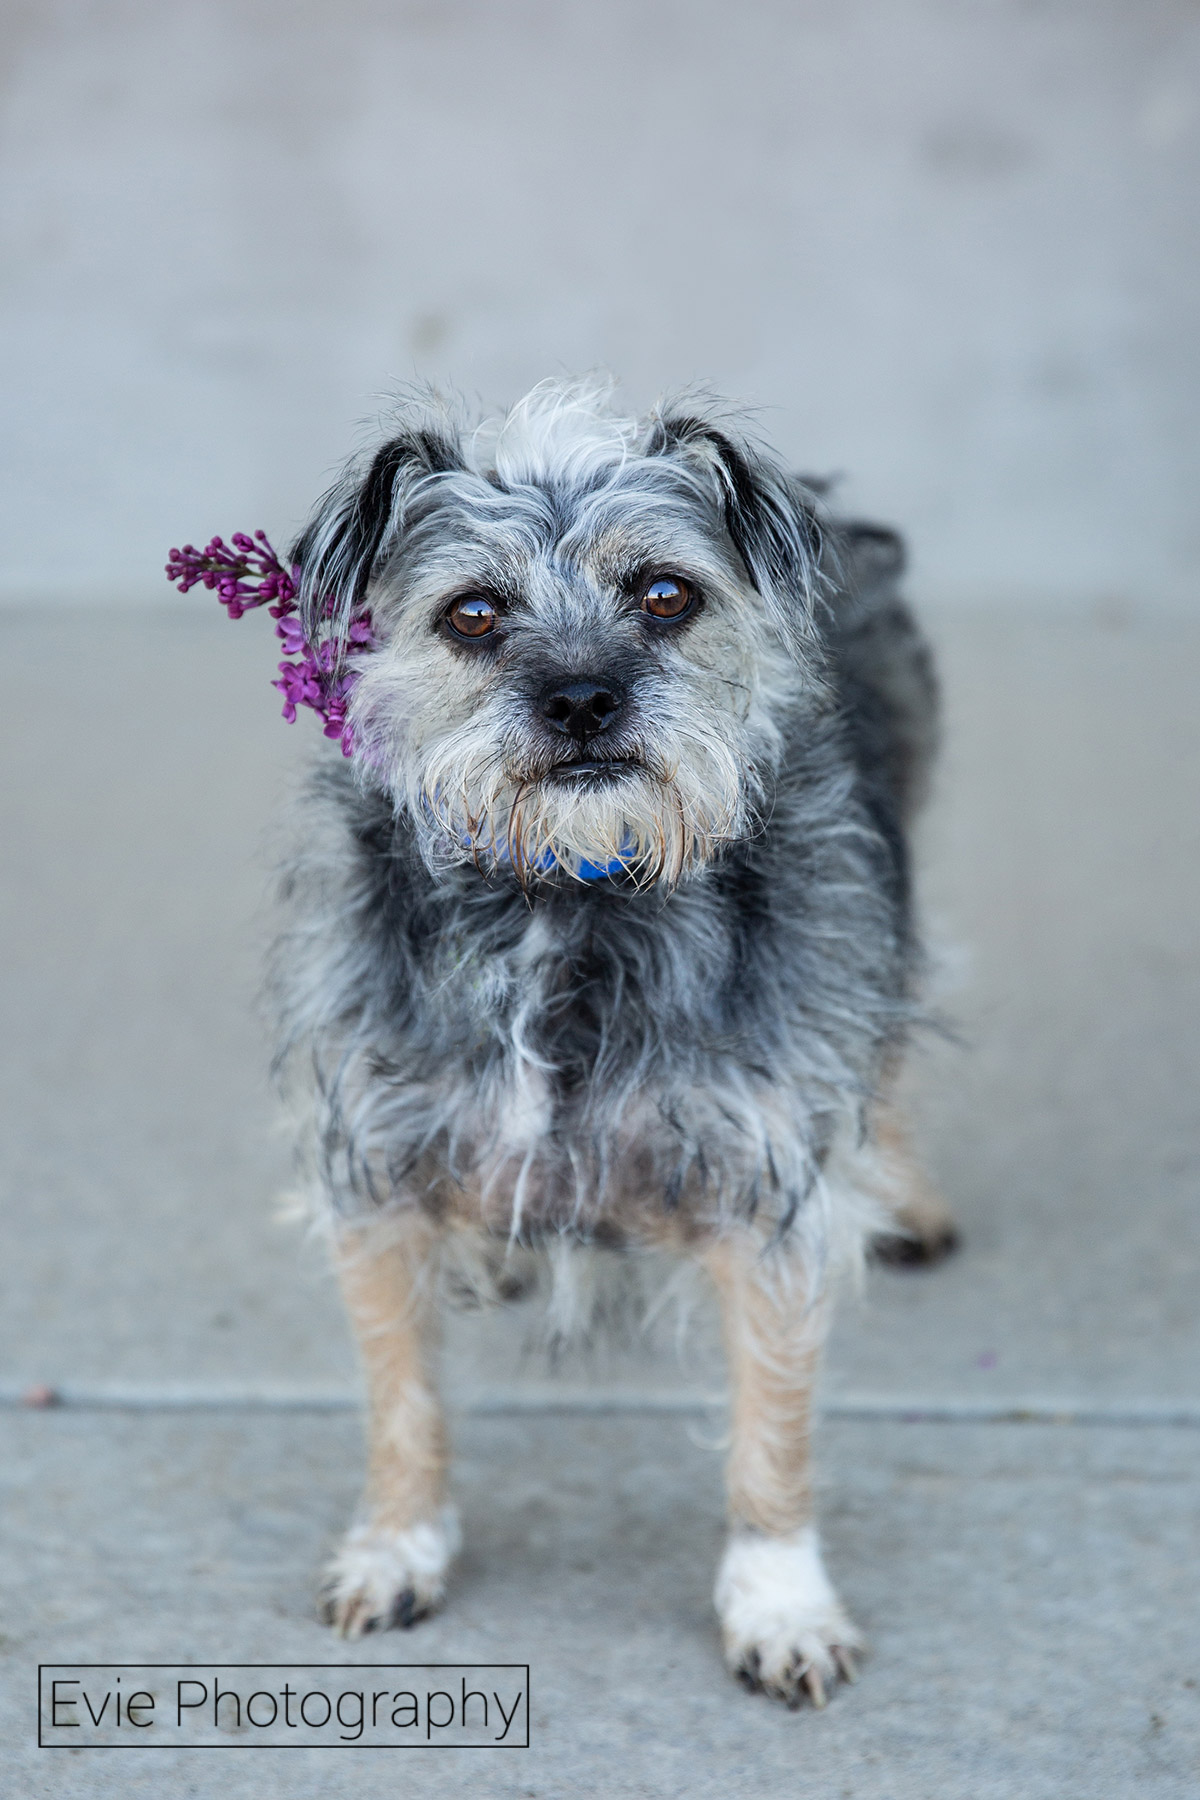 Boulder-Pet-Photography-Evie-Photoraphy-Mrs.-Pibb180